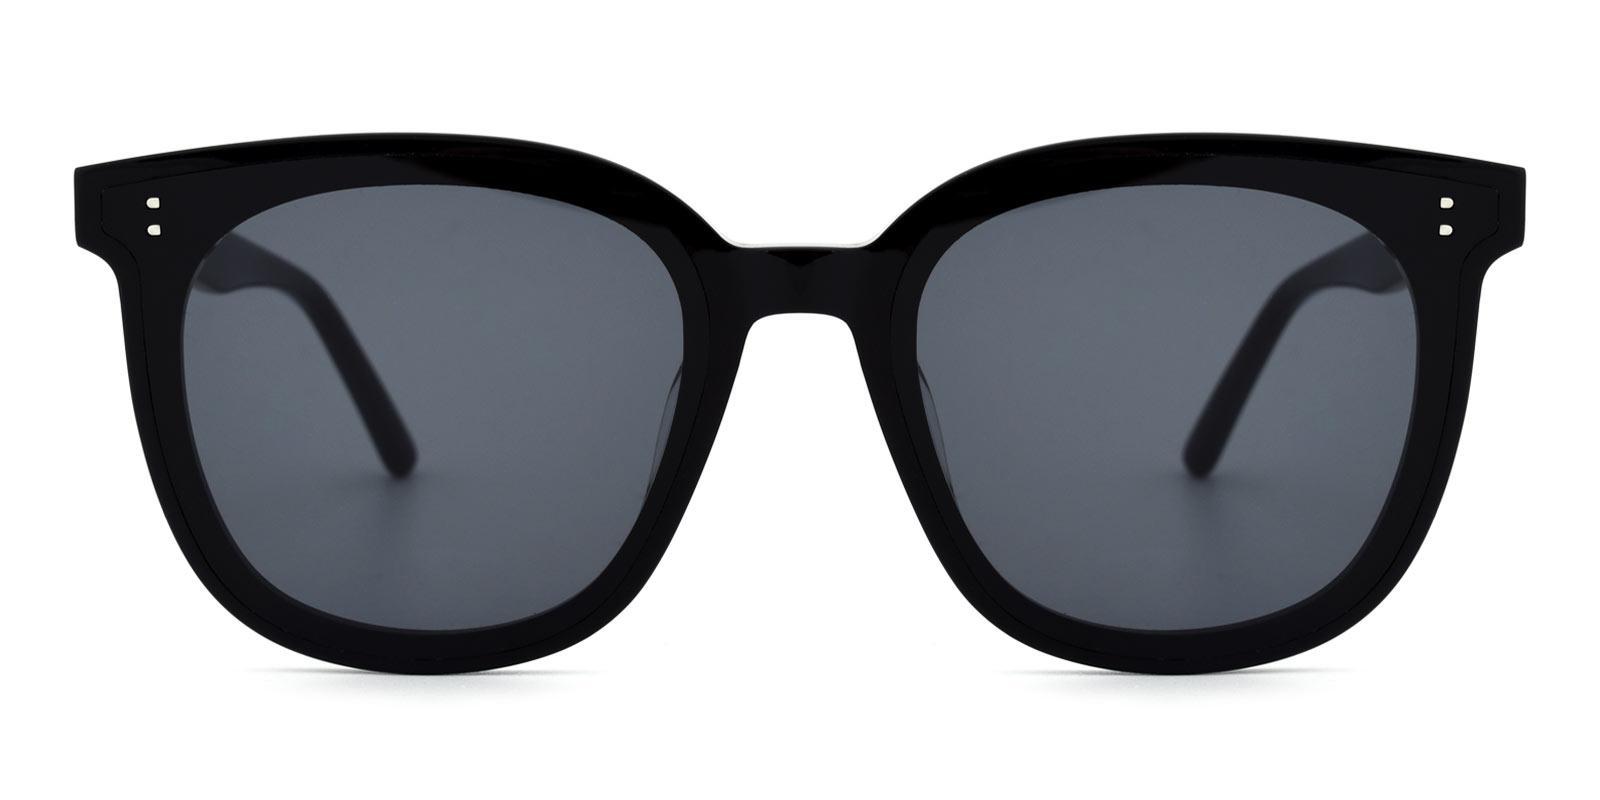 Starry-Black-Rectangle-TR-Sunglasses-detail